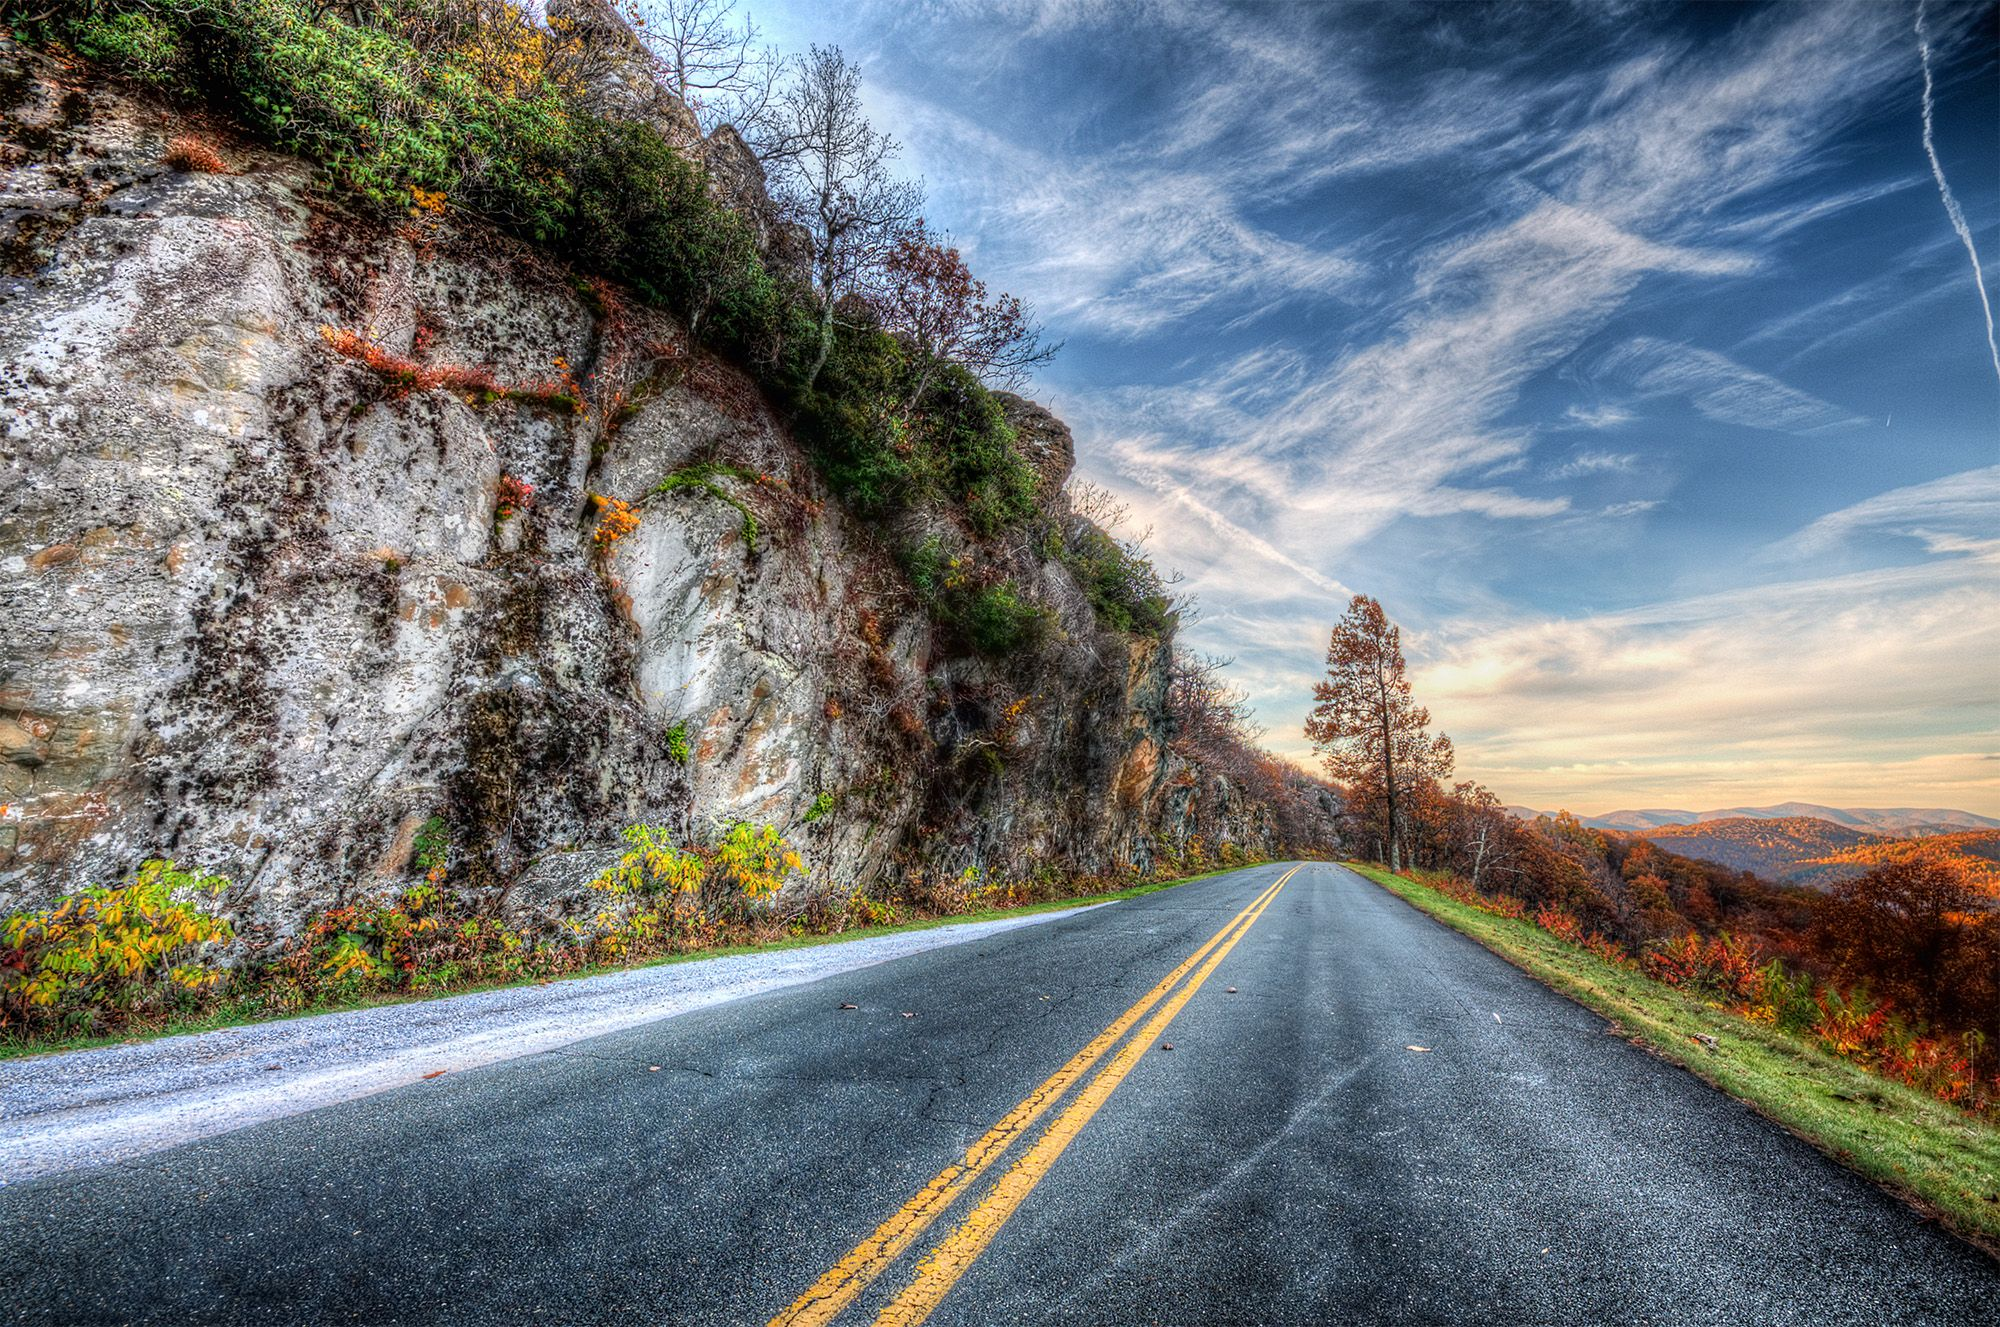 ...take me Home! Photo by Bill Dickinson @ SkyNoir